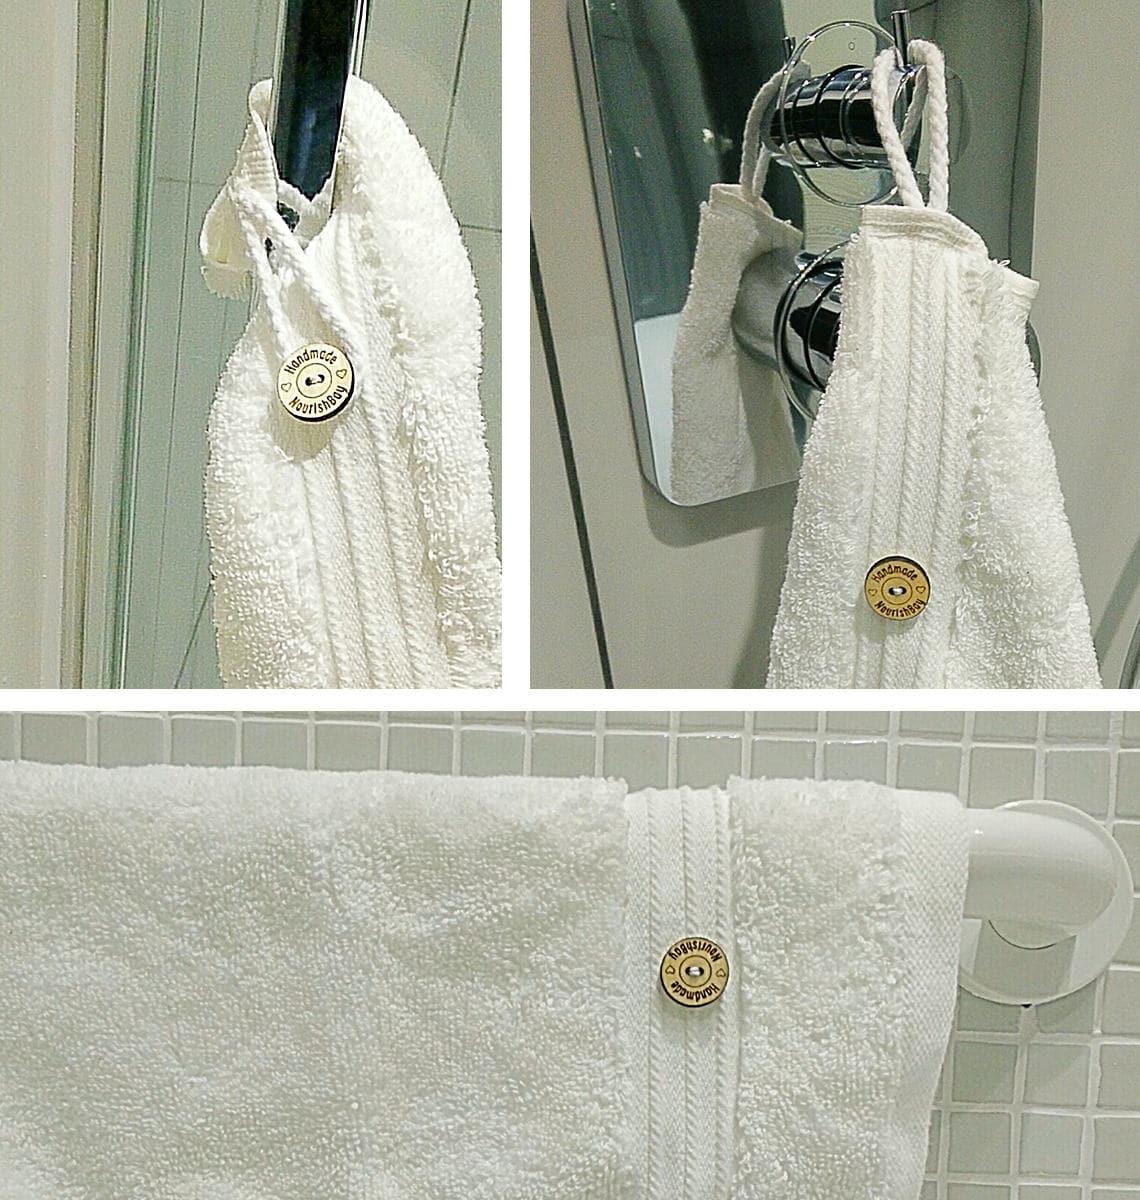 Travel Towel Japan: Cotton Travel Towel Shaving Towel Gym Towel Camping Towel